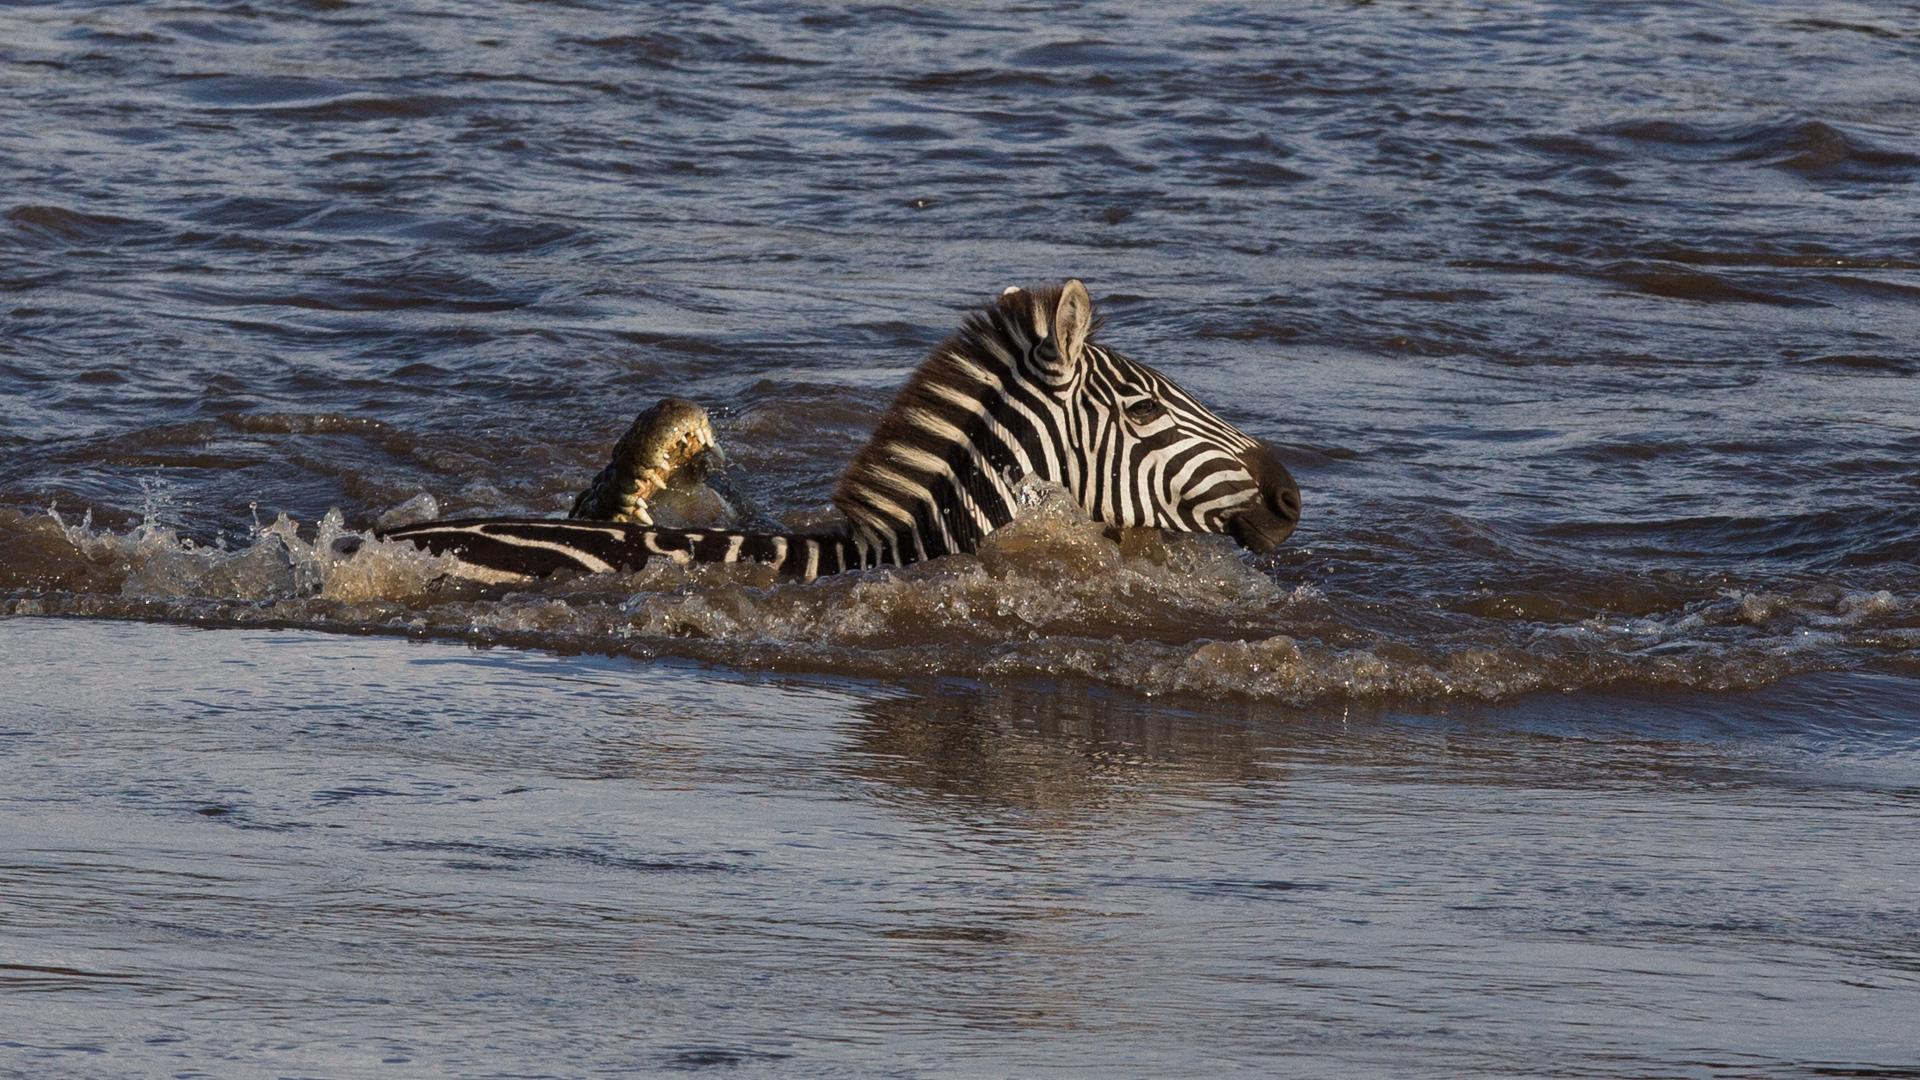 Crocodile catching zebra